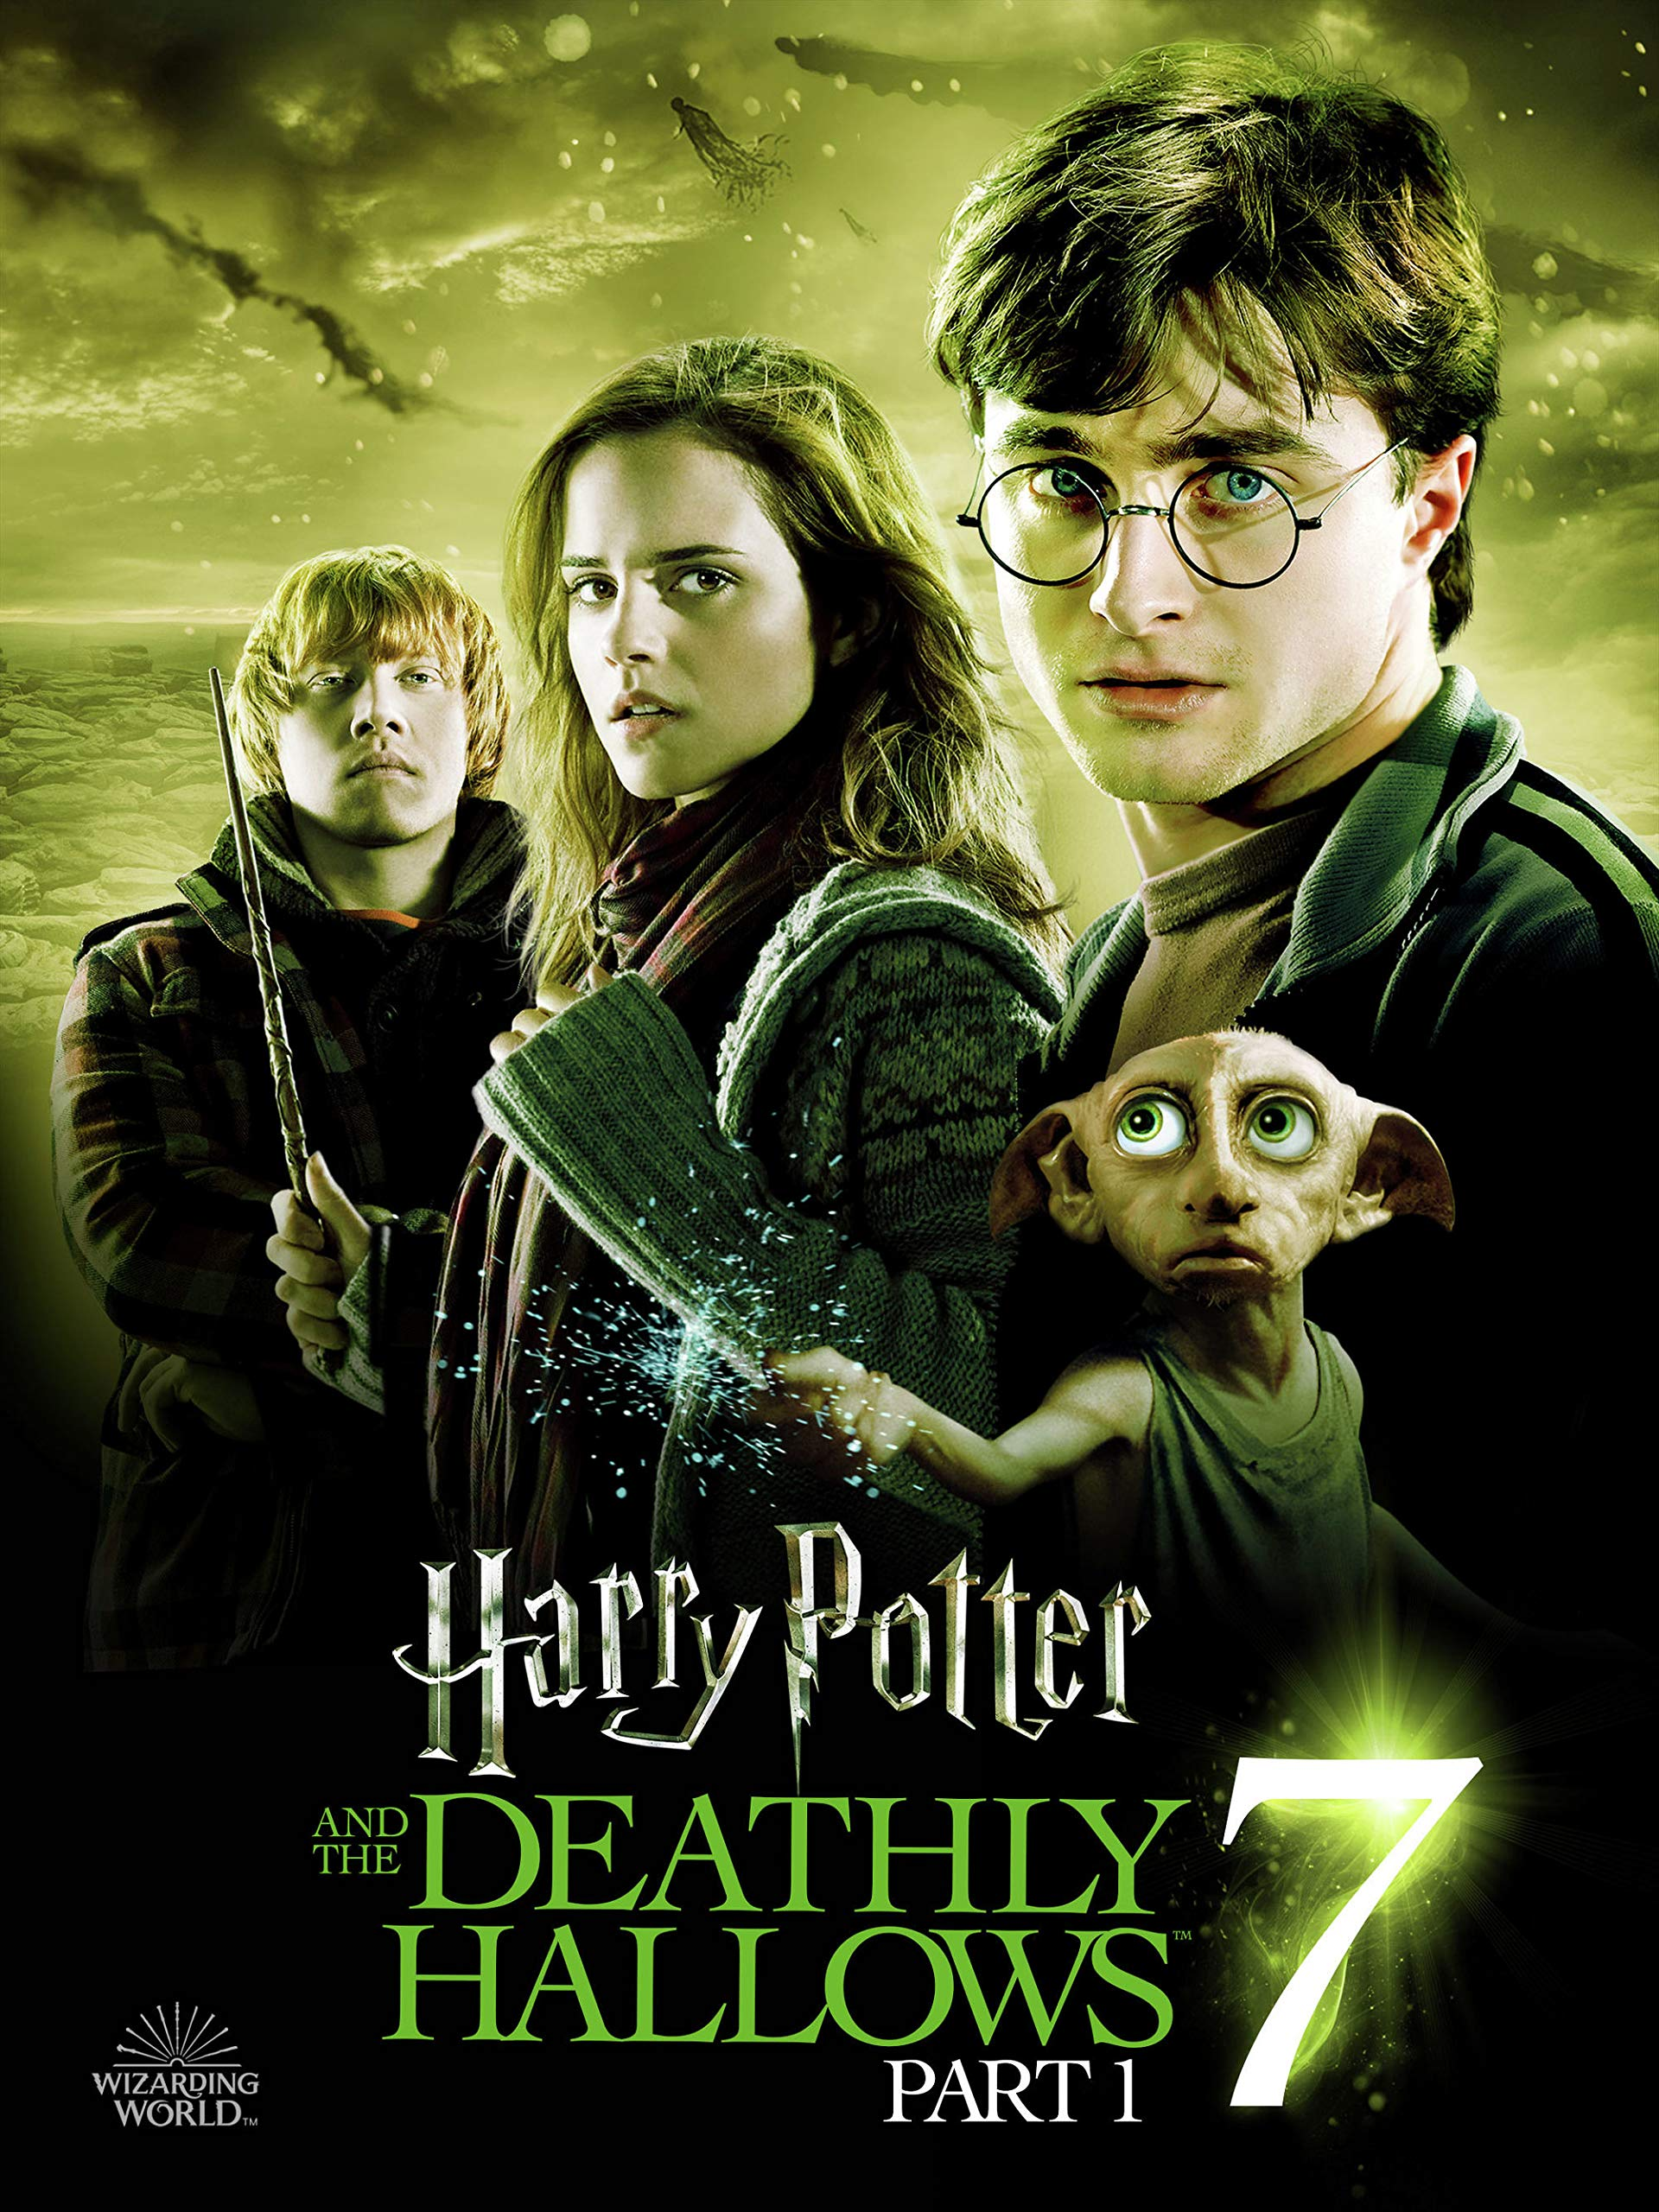 Amazon Com Harry Potter And The Deathly Hallows Part 1 Daniel Radcliffe Rupert Grint Emma Watson Helena Bonham Carter